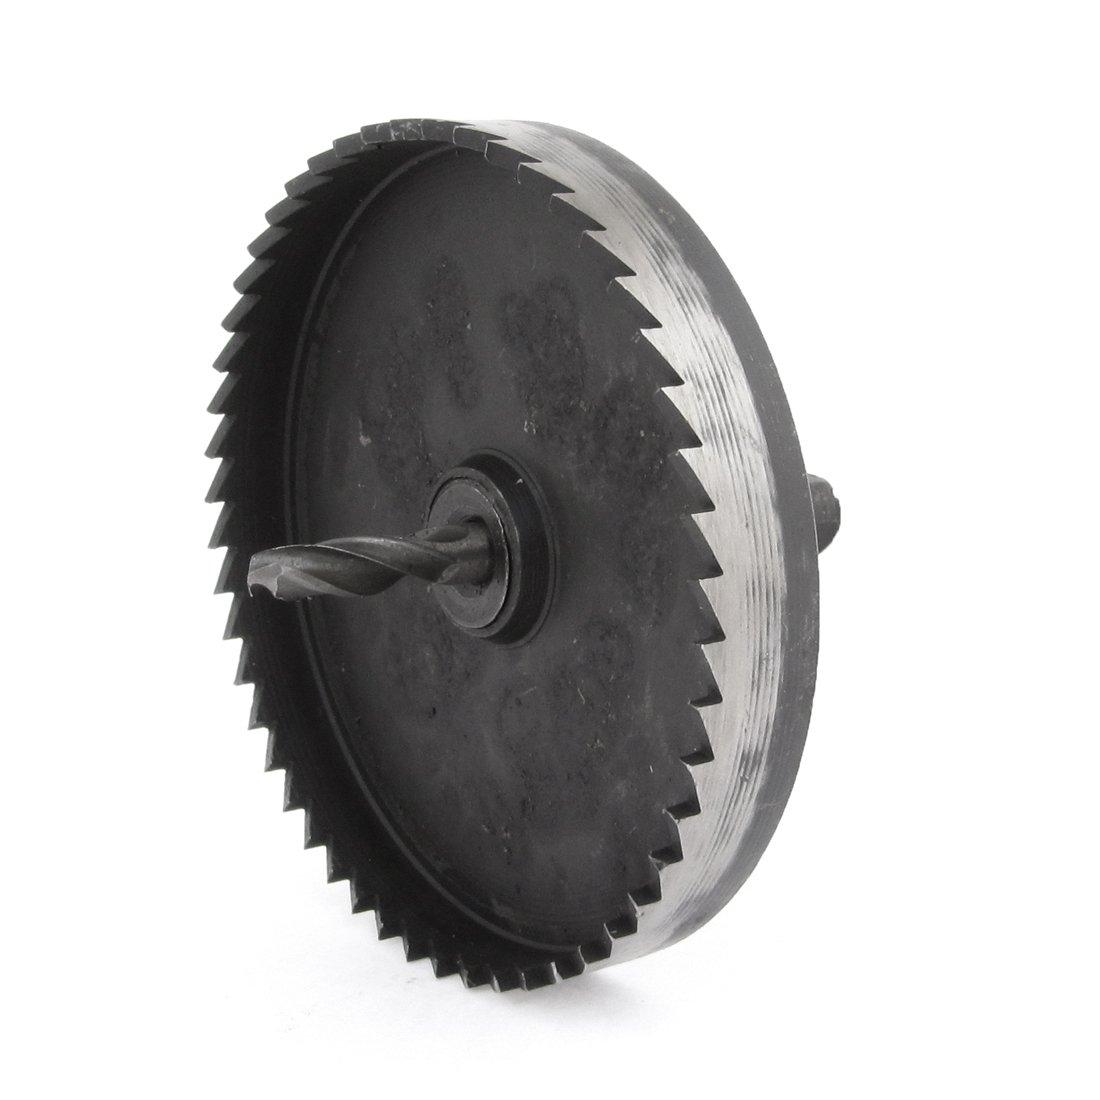 Negro HSS 6 mm corona de puntas 85 mm para cortar sierra perforadora el/éctrica